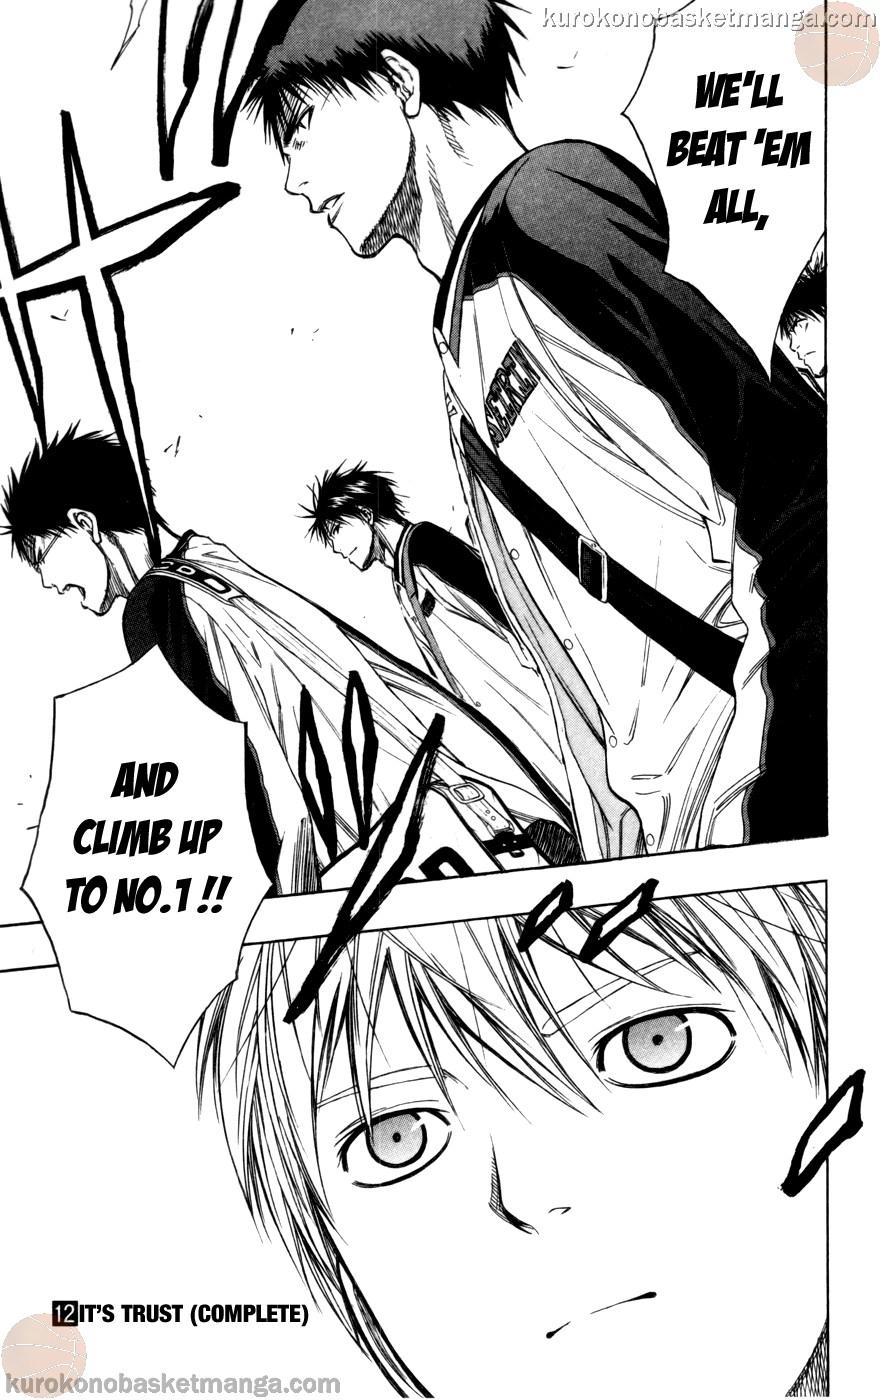 Kuroko no Basket Manga Chapter 108 - Image 19